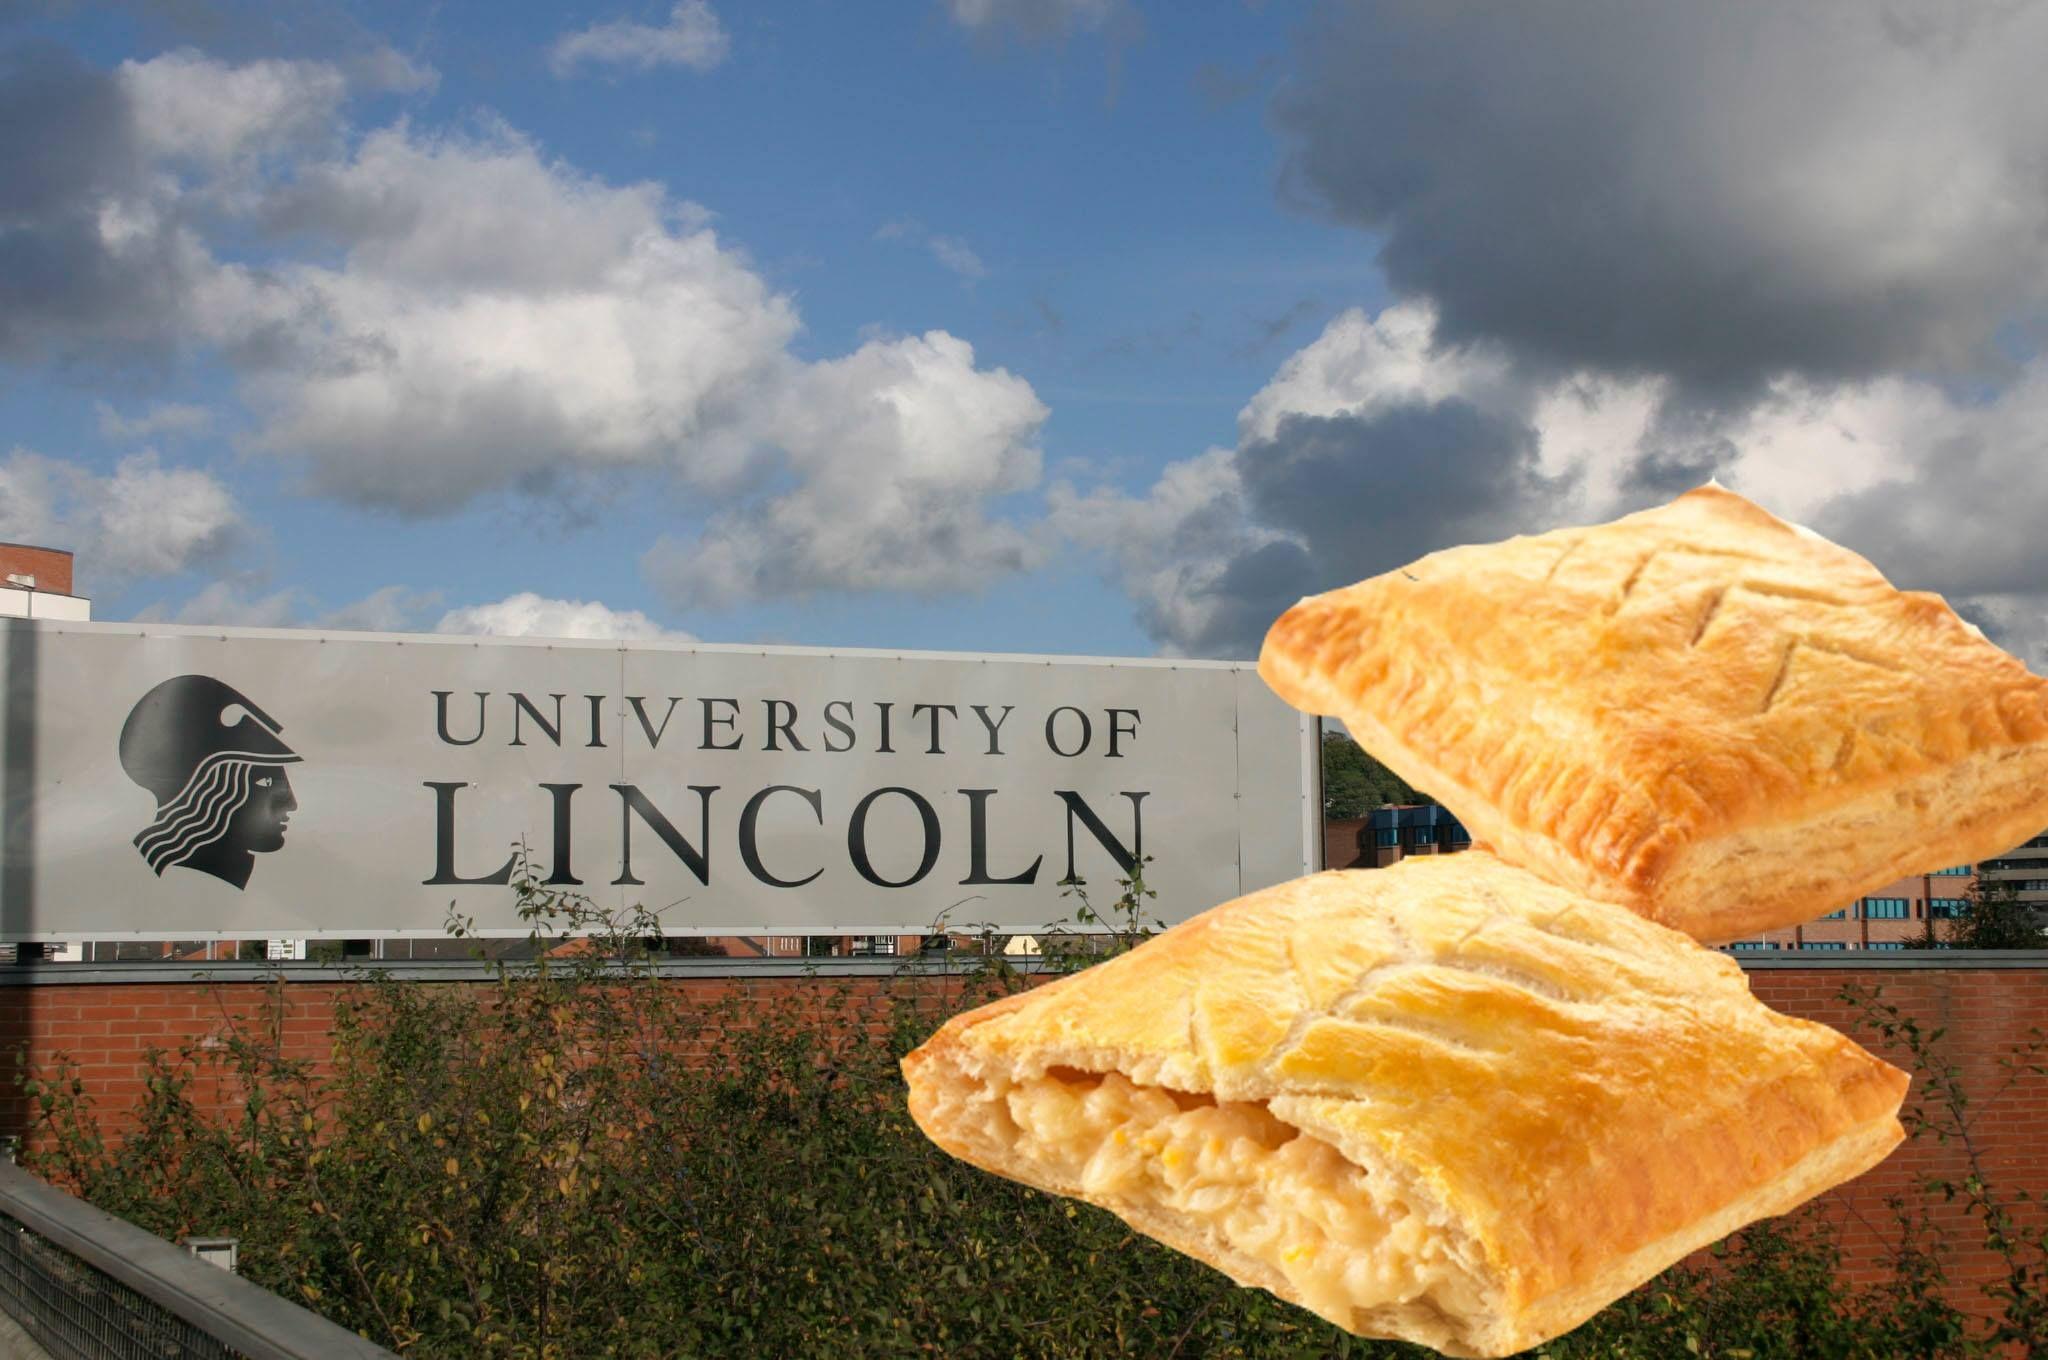 Image may contain: Pastry, Dessert, Food, Cracker, Bread, Transportation, Blimp, Airship, Aircraft